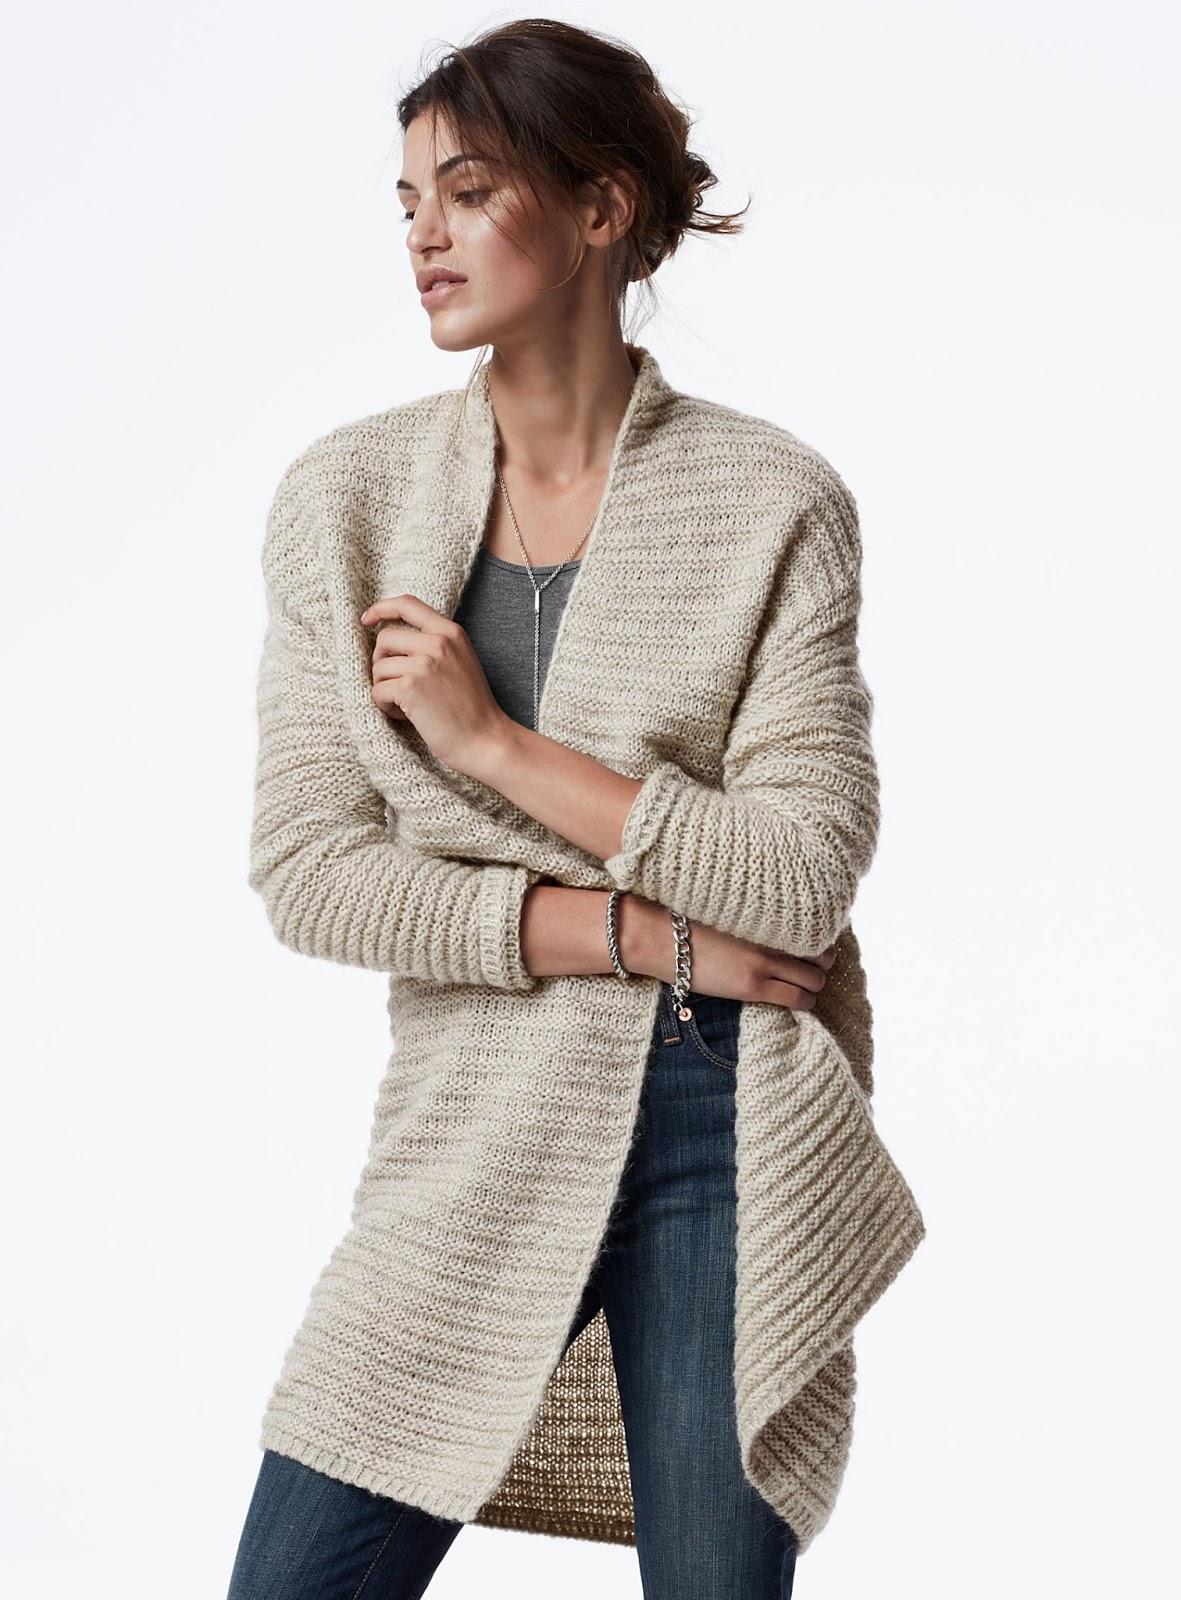 5 nouvelles façons de porter ton maxi cardigan beige